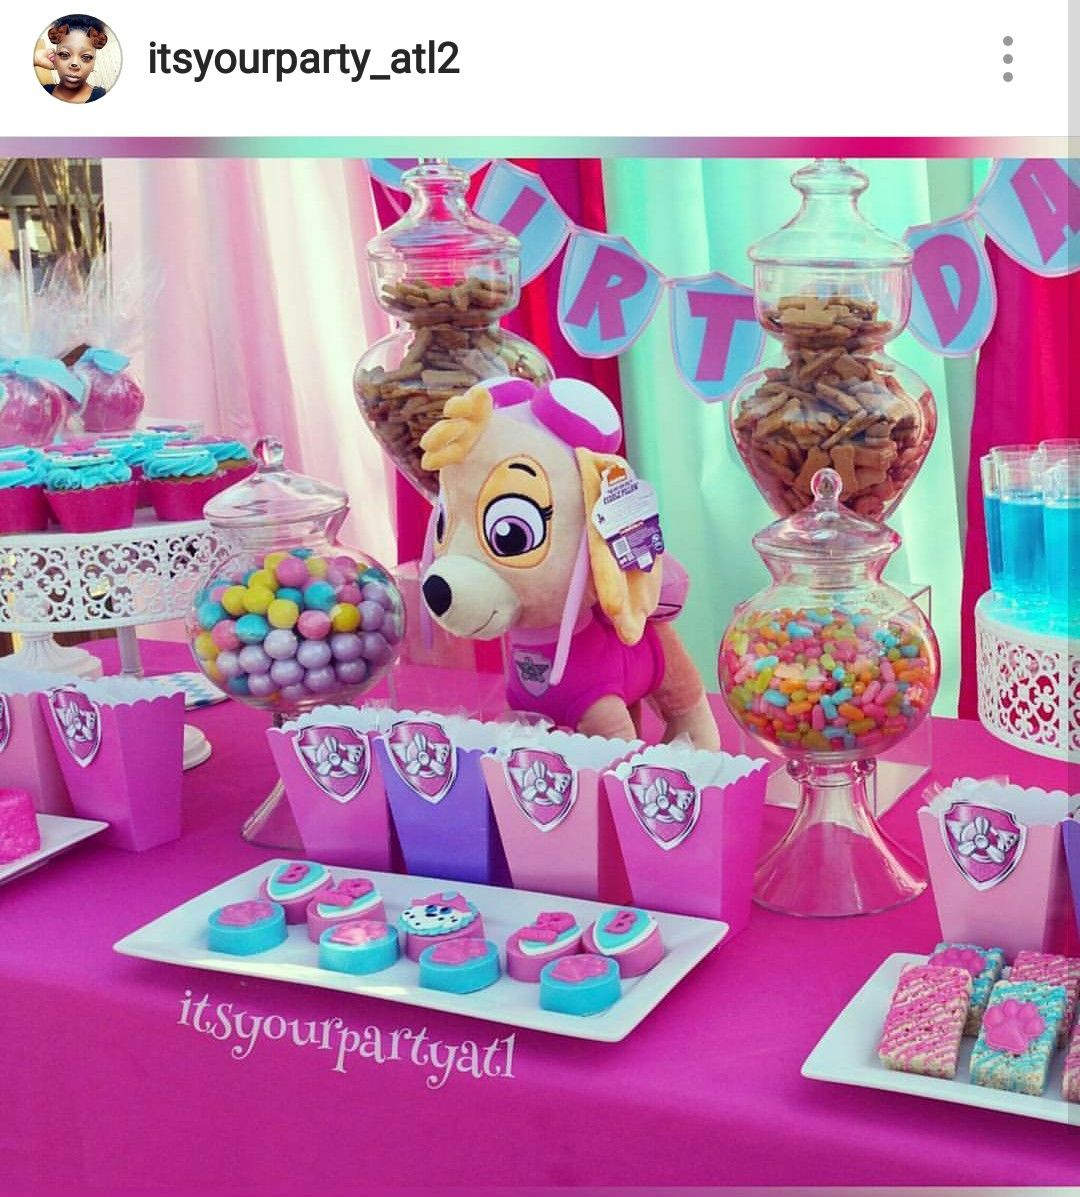 Pink Paw Patrol Birthday Party Dessert Table And Decor Paw Party Skye Paw Patrol Party Paw Patrol Birthday Party